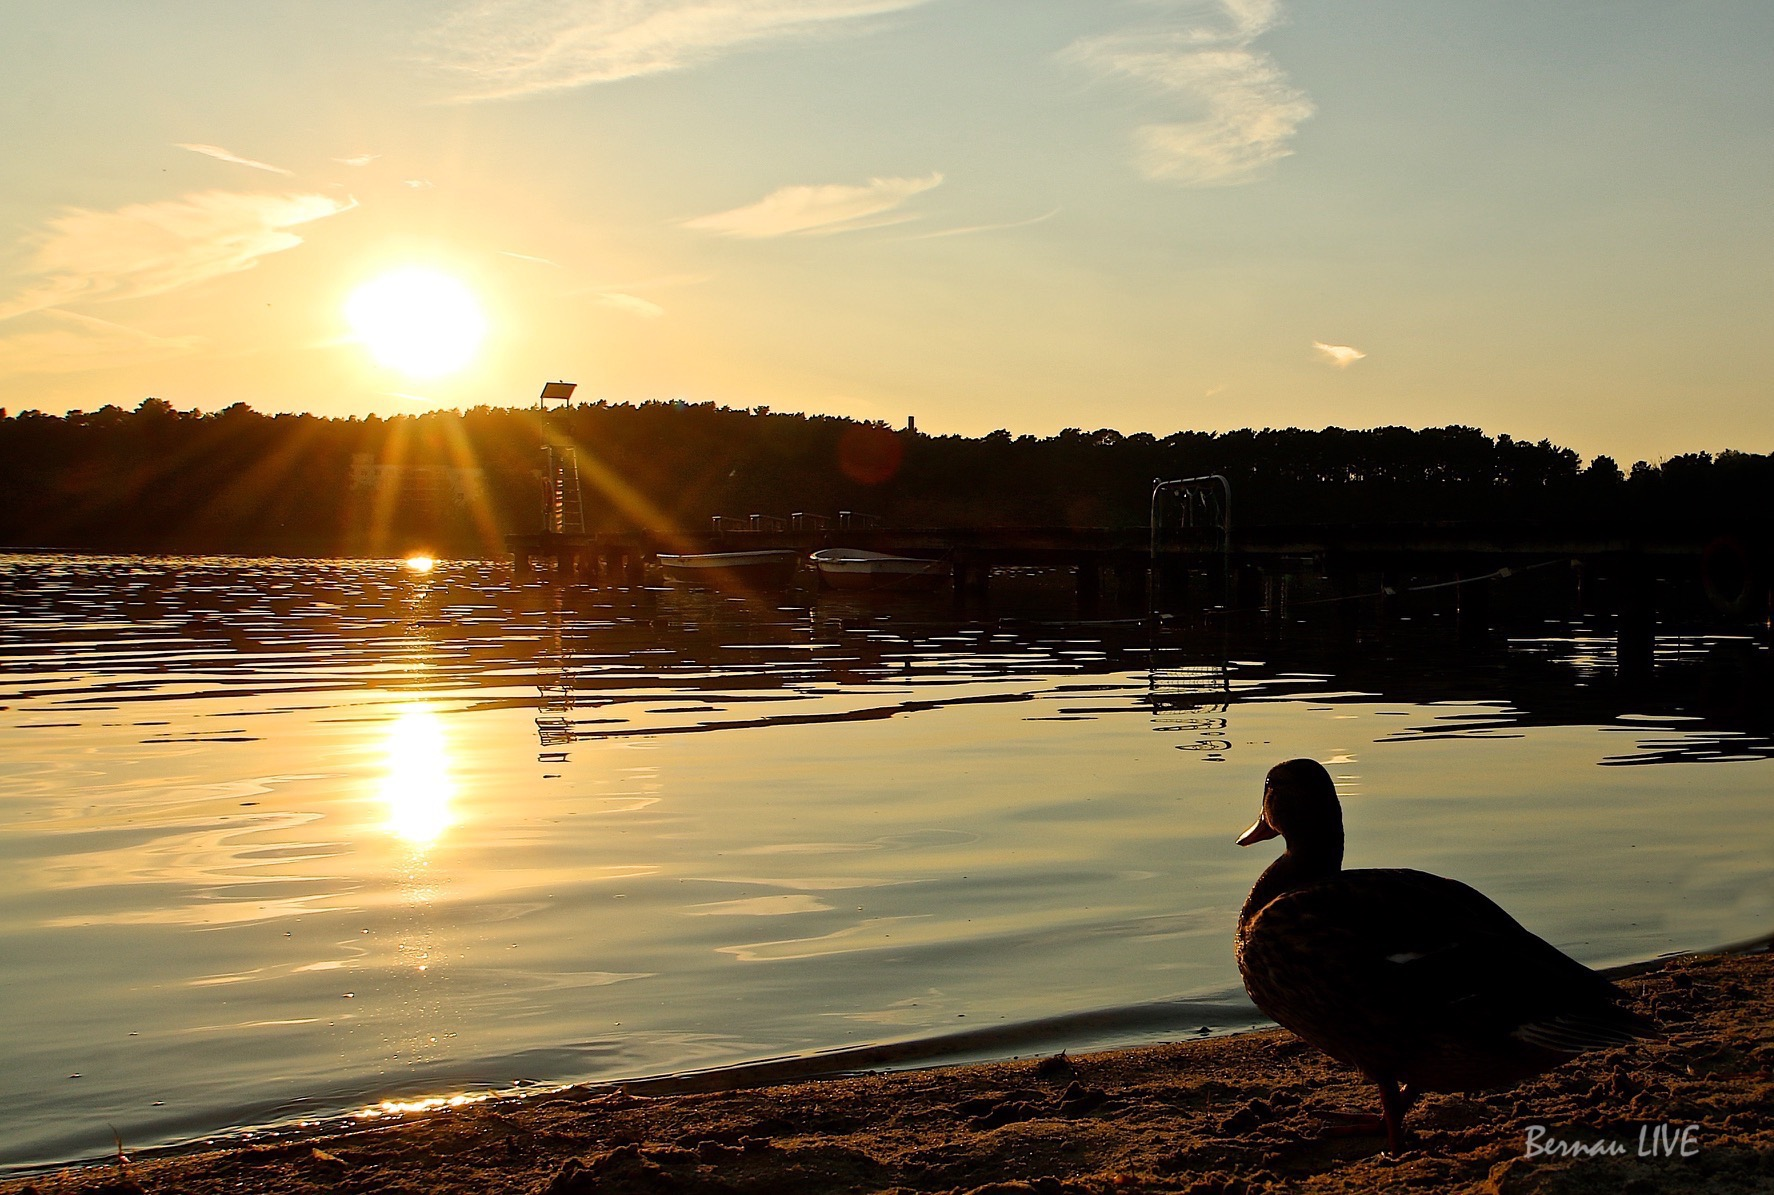 Strandbad Wukensee - Bernau LIVE, Sonnenuntergang, Wasser, Wukensee, Barnim, Sommer, Ente, Bernau, Biesenthal